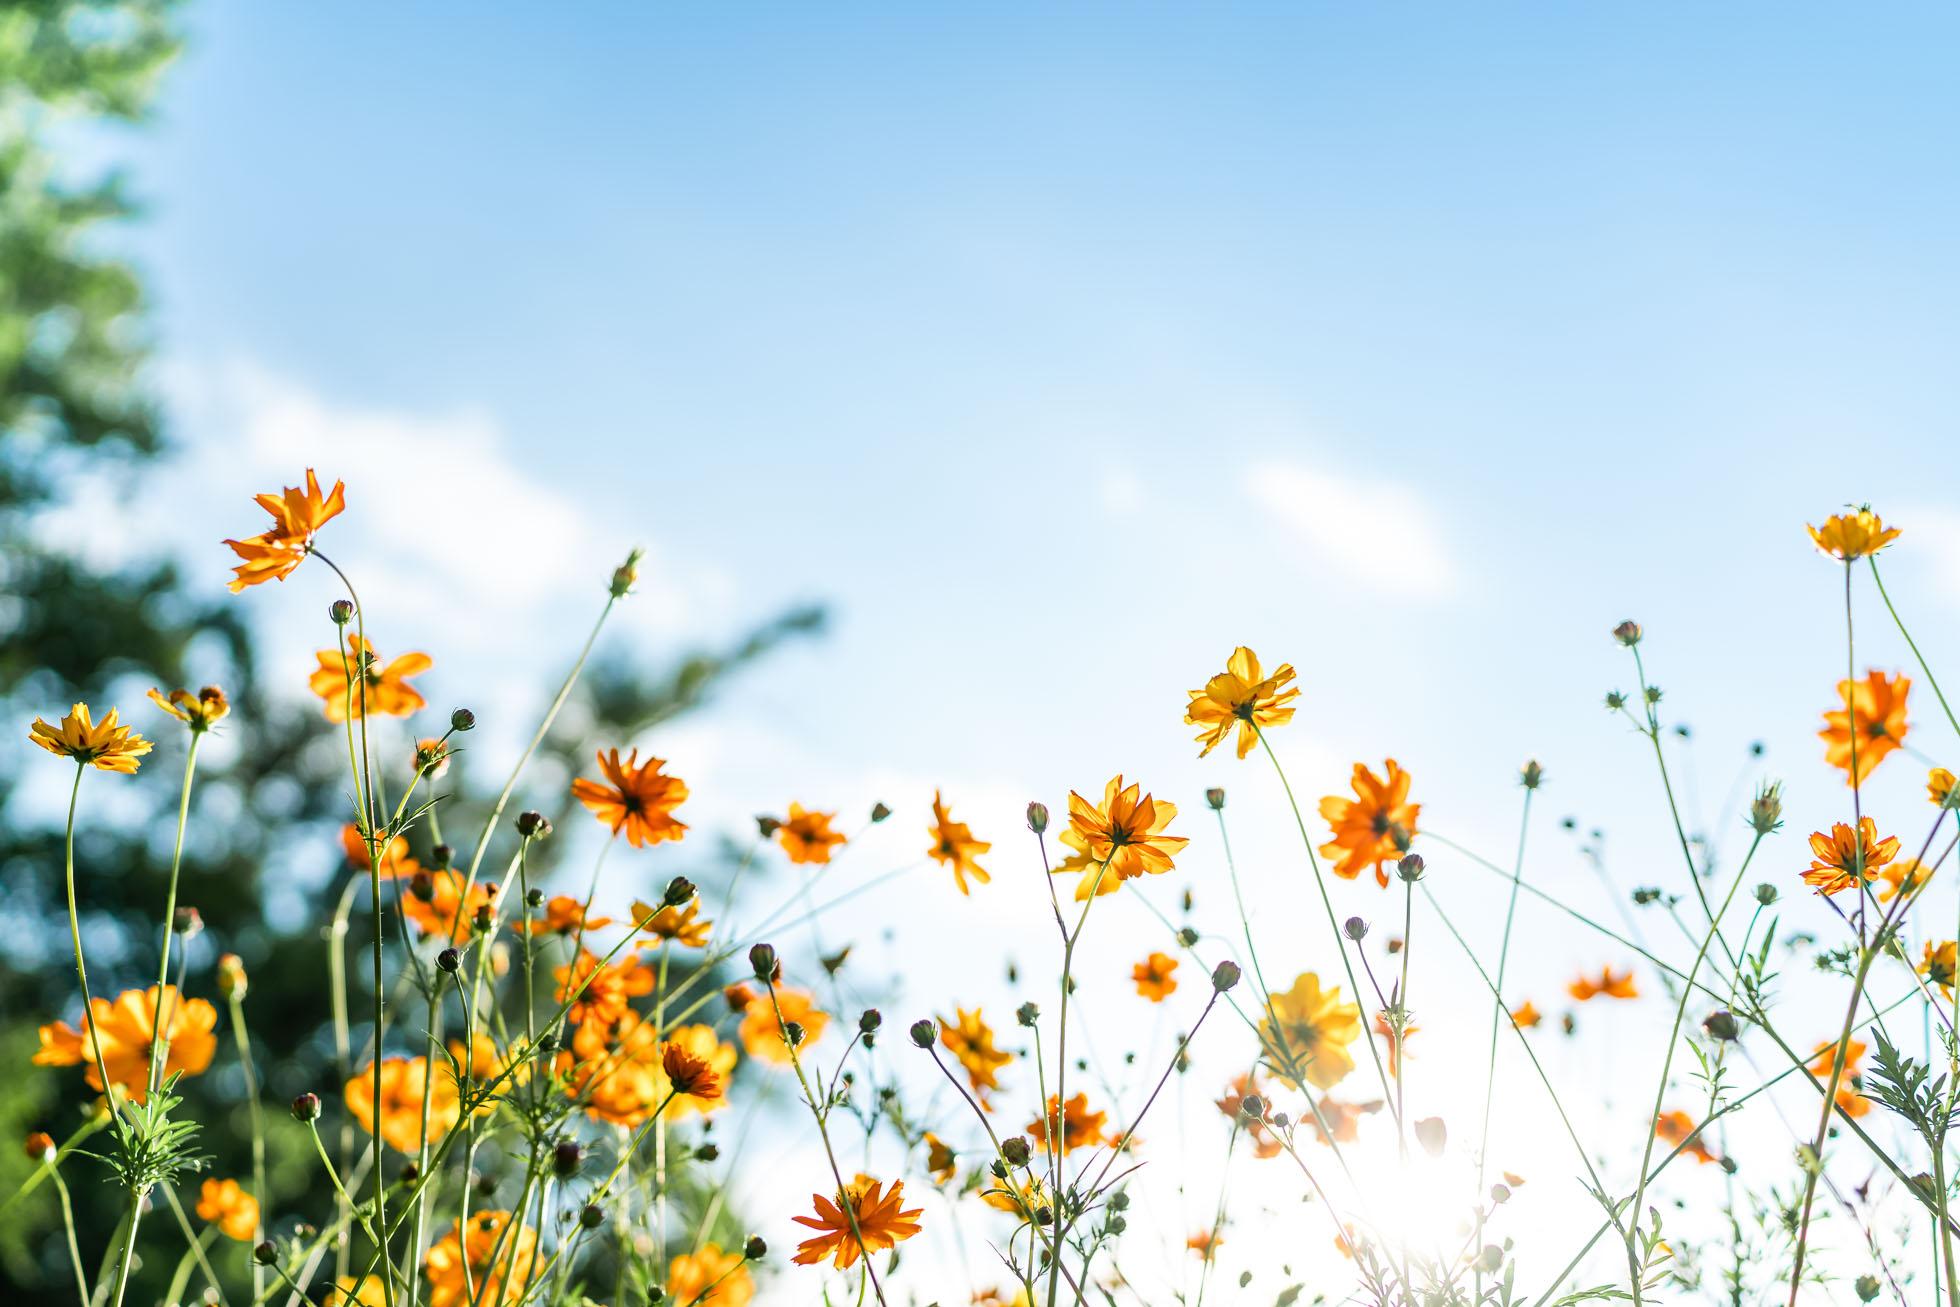 orange wildflowers against blue sky by jennifer carr